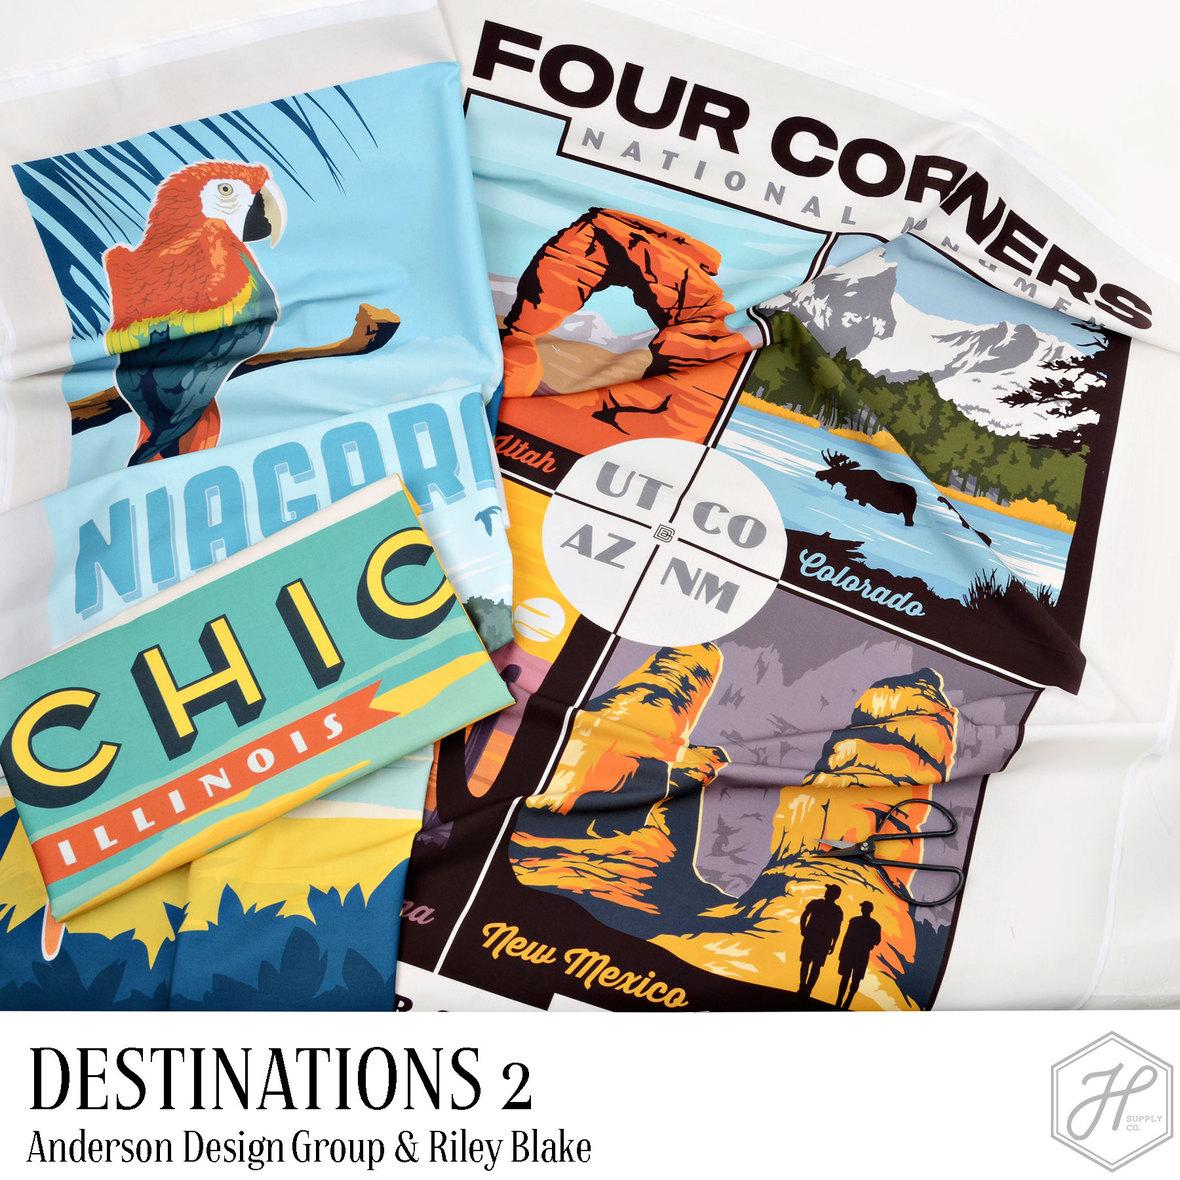 Destinations-Panels-Fabric-Riley-Blake-at-Hawthorne-Supply-Co